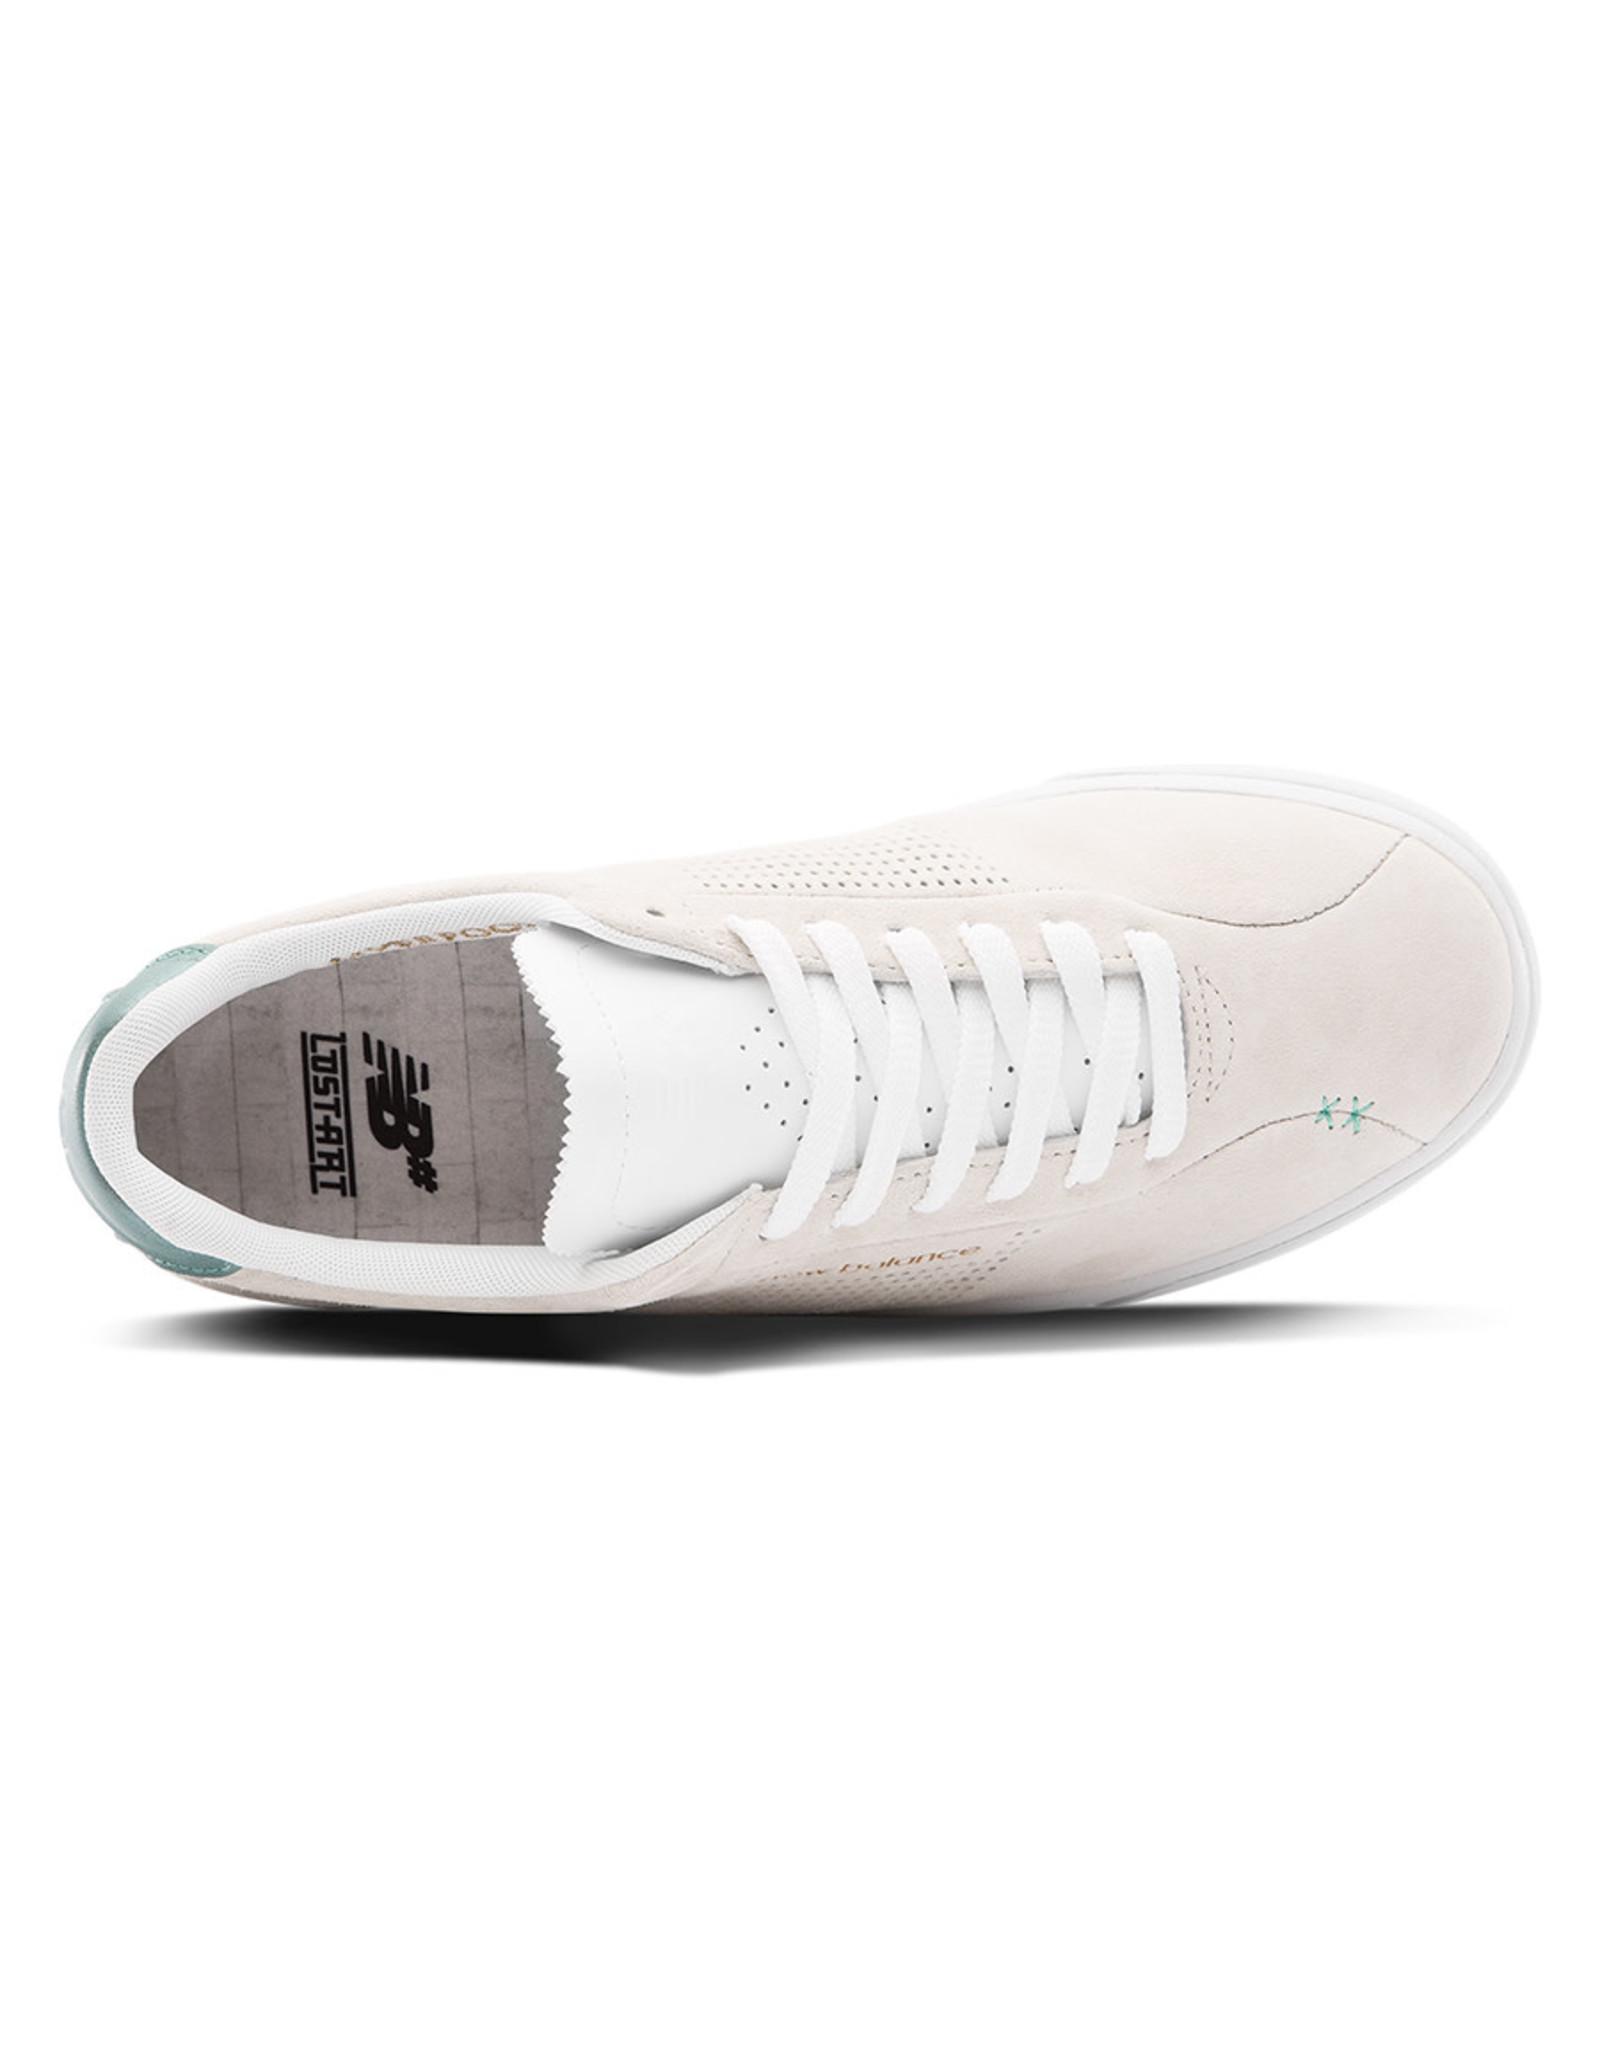 New Balance Numeric New Balance Numeric Shoe NM22 X Lost Art (Off White/Aqua)